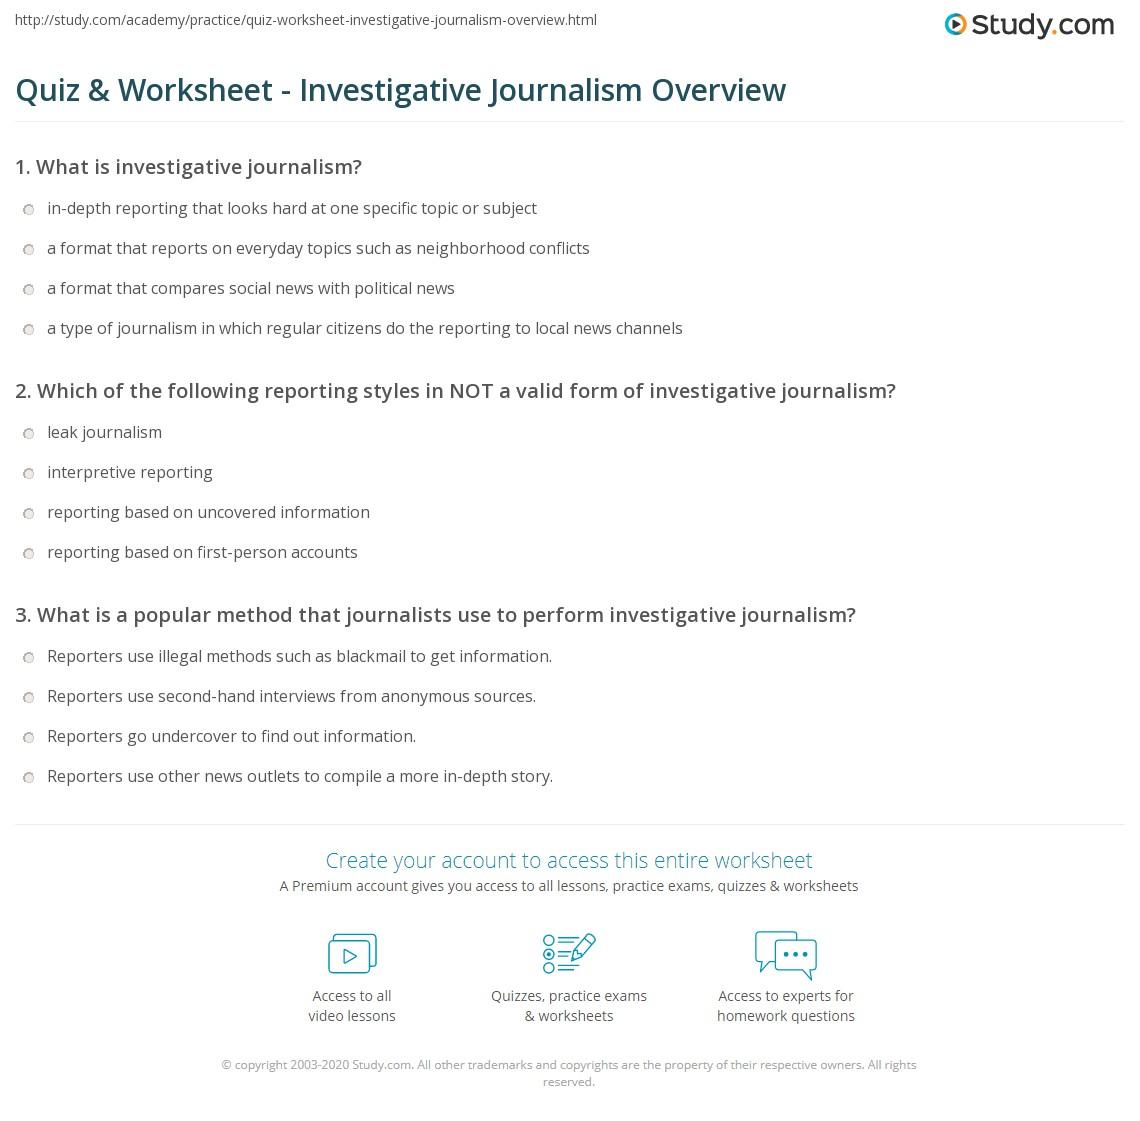 quiz worksheet investigative journalism overview study com